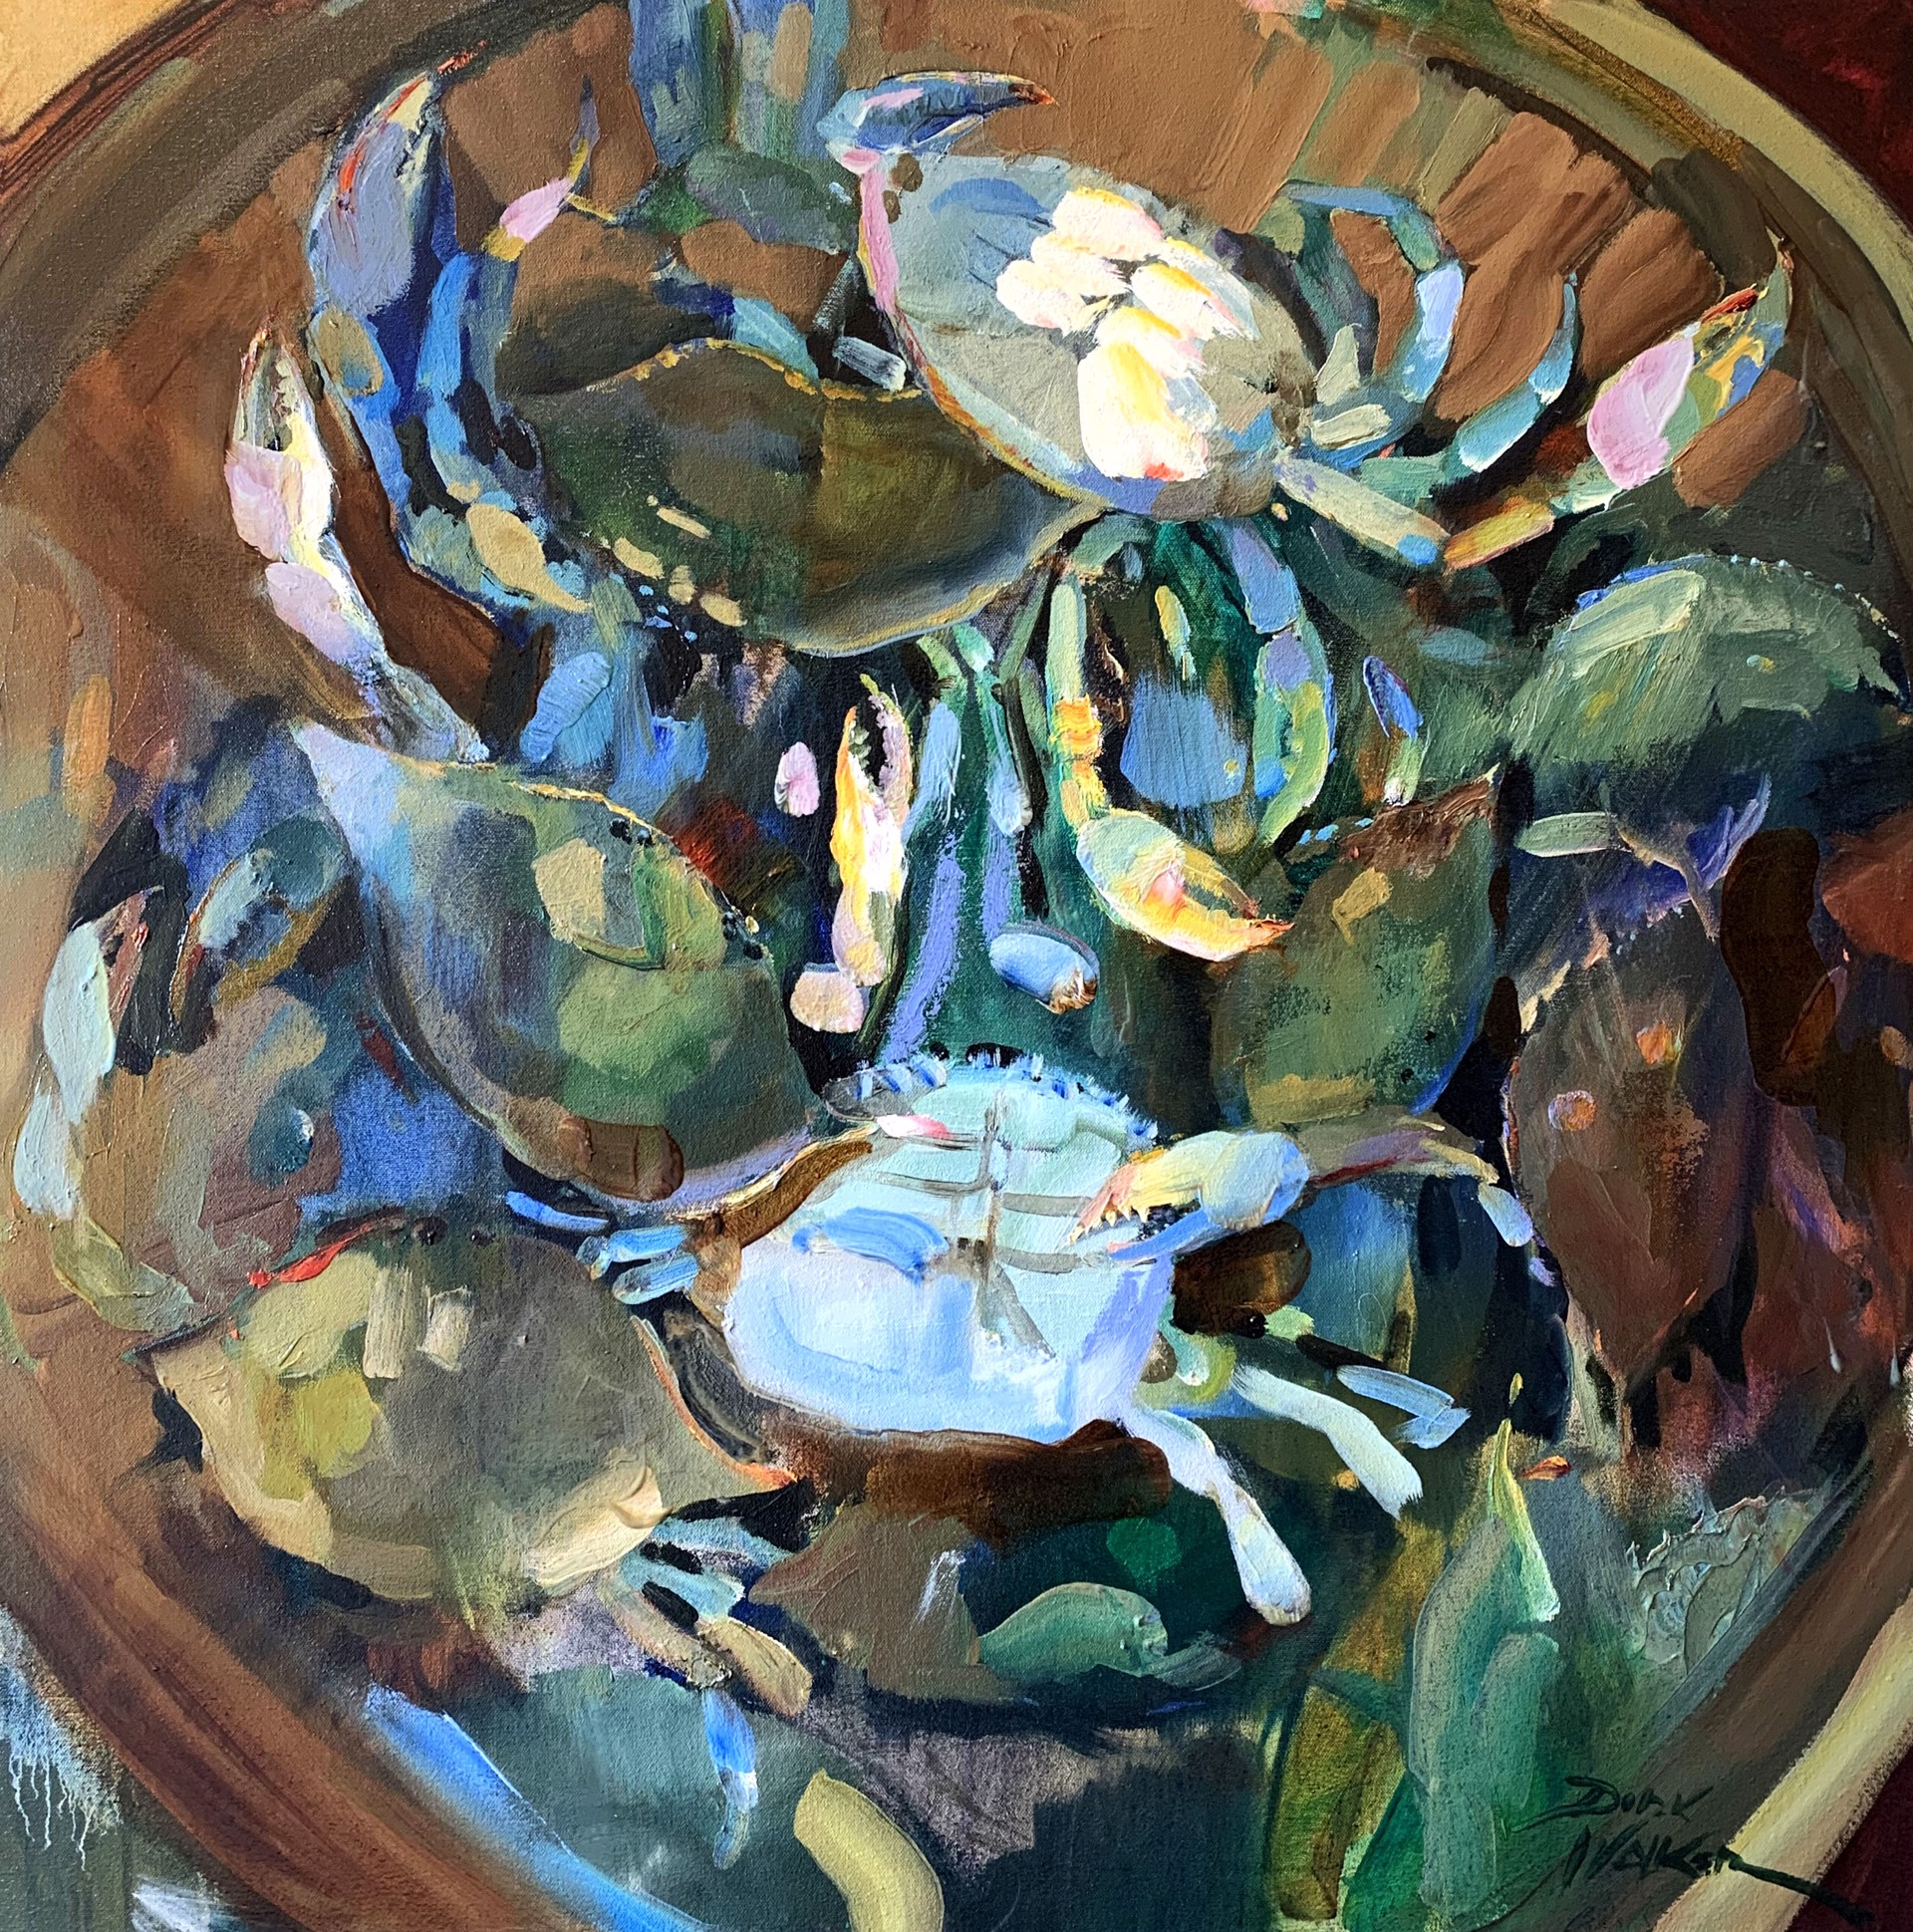 Fresh Blue Crabs by Dirk Walker